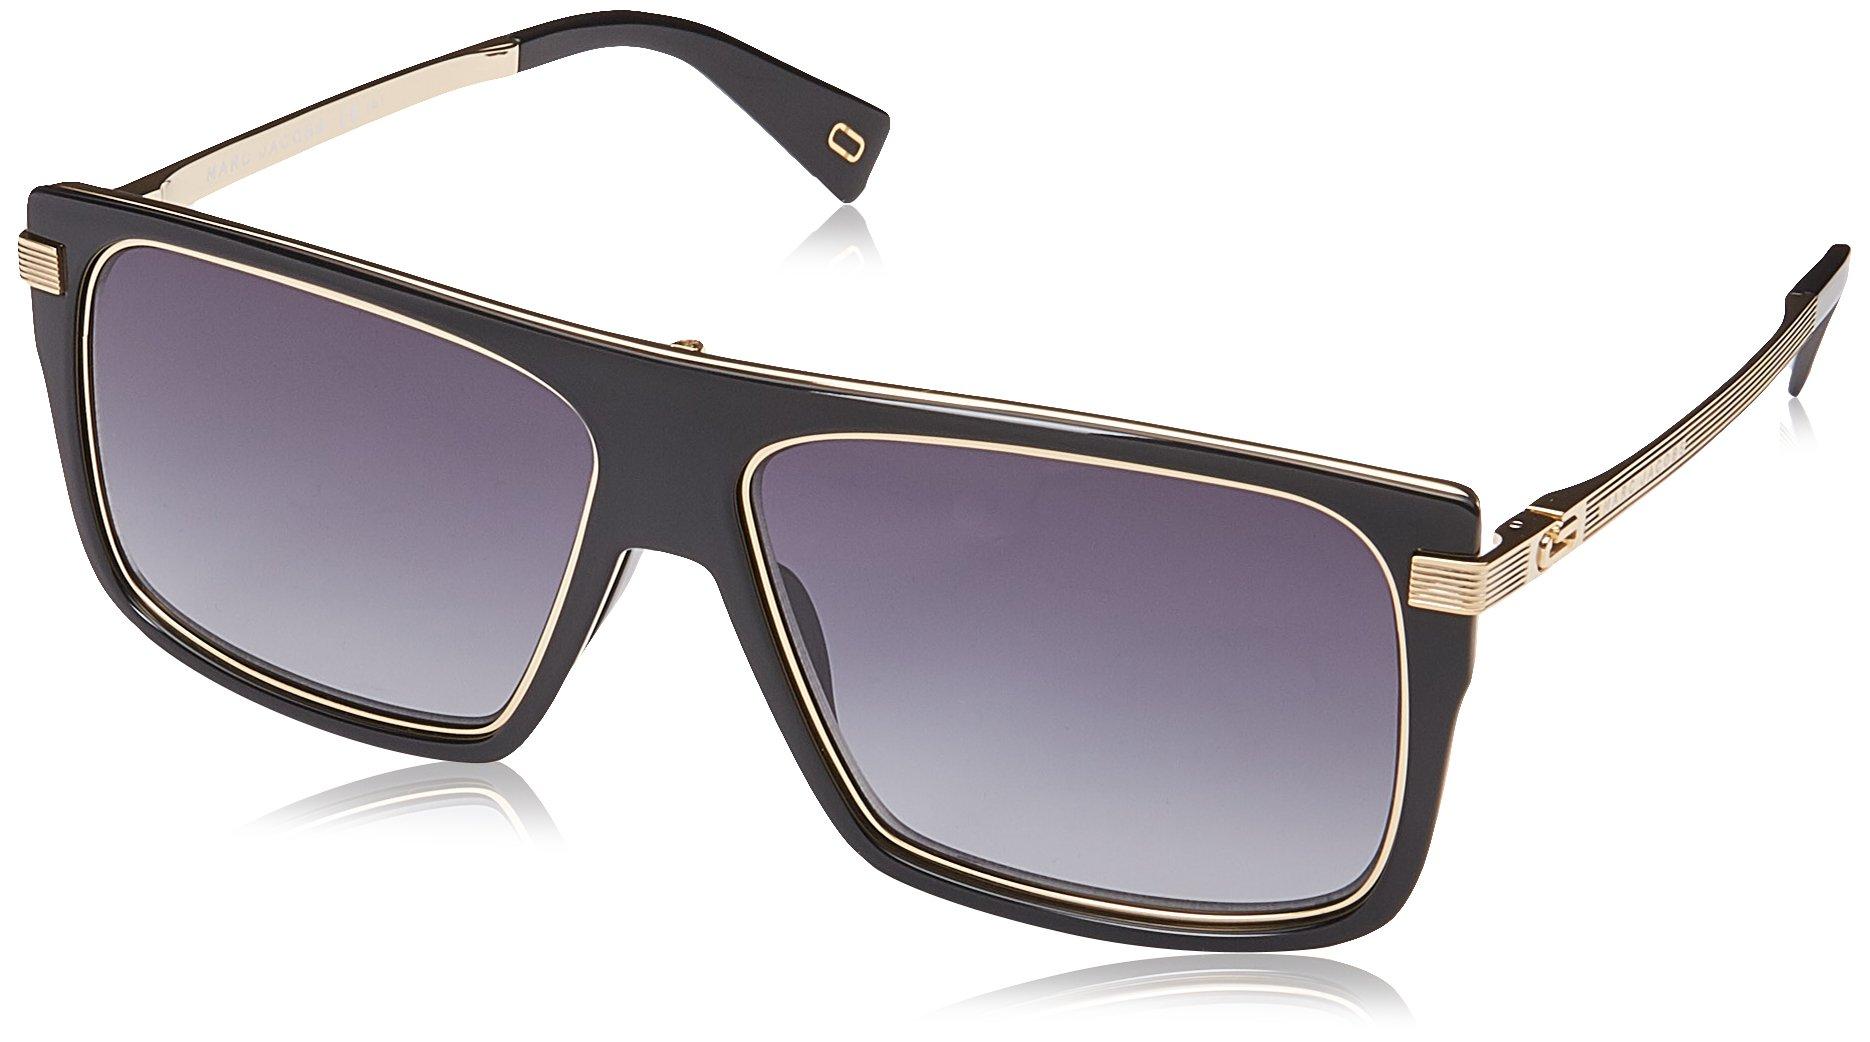 Marc Jacobs Marc 242/S 9O 2M2 59 Gafas de Sol, Negro (Black Gold/Brown), Hombre